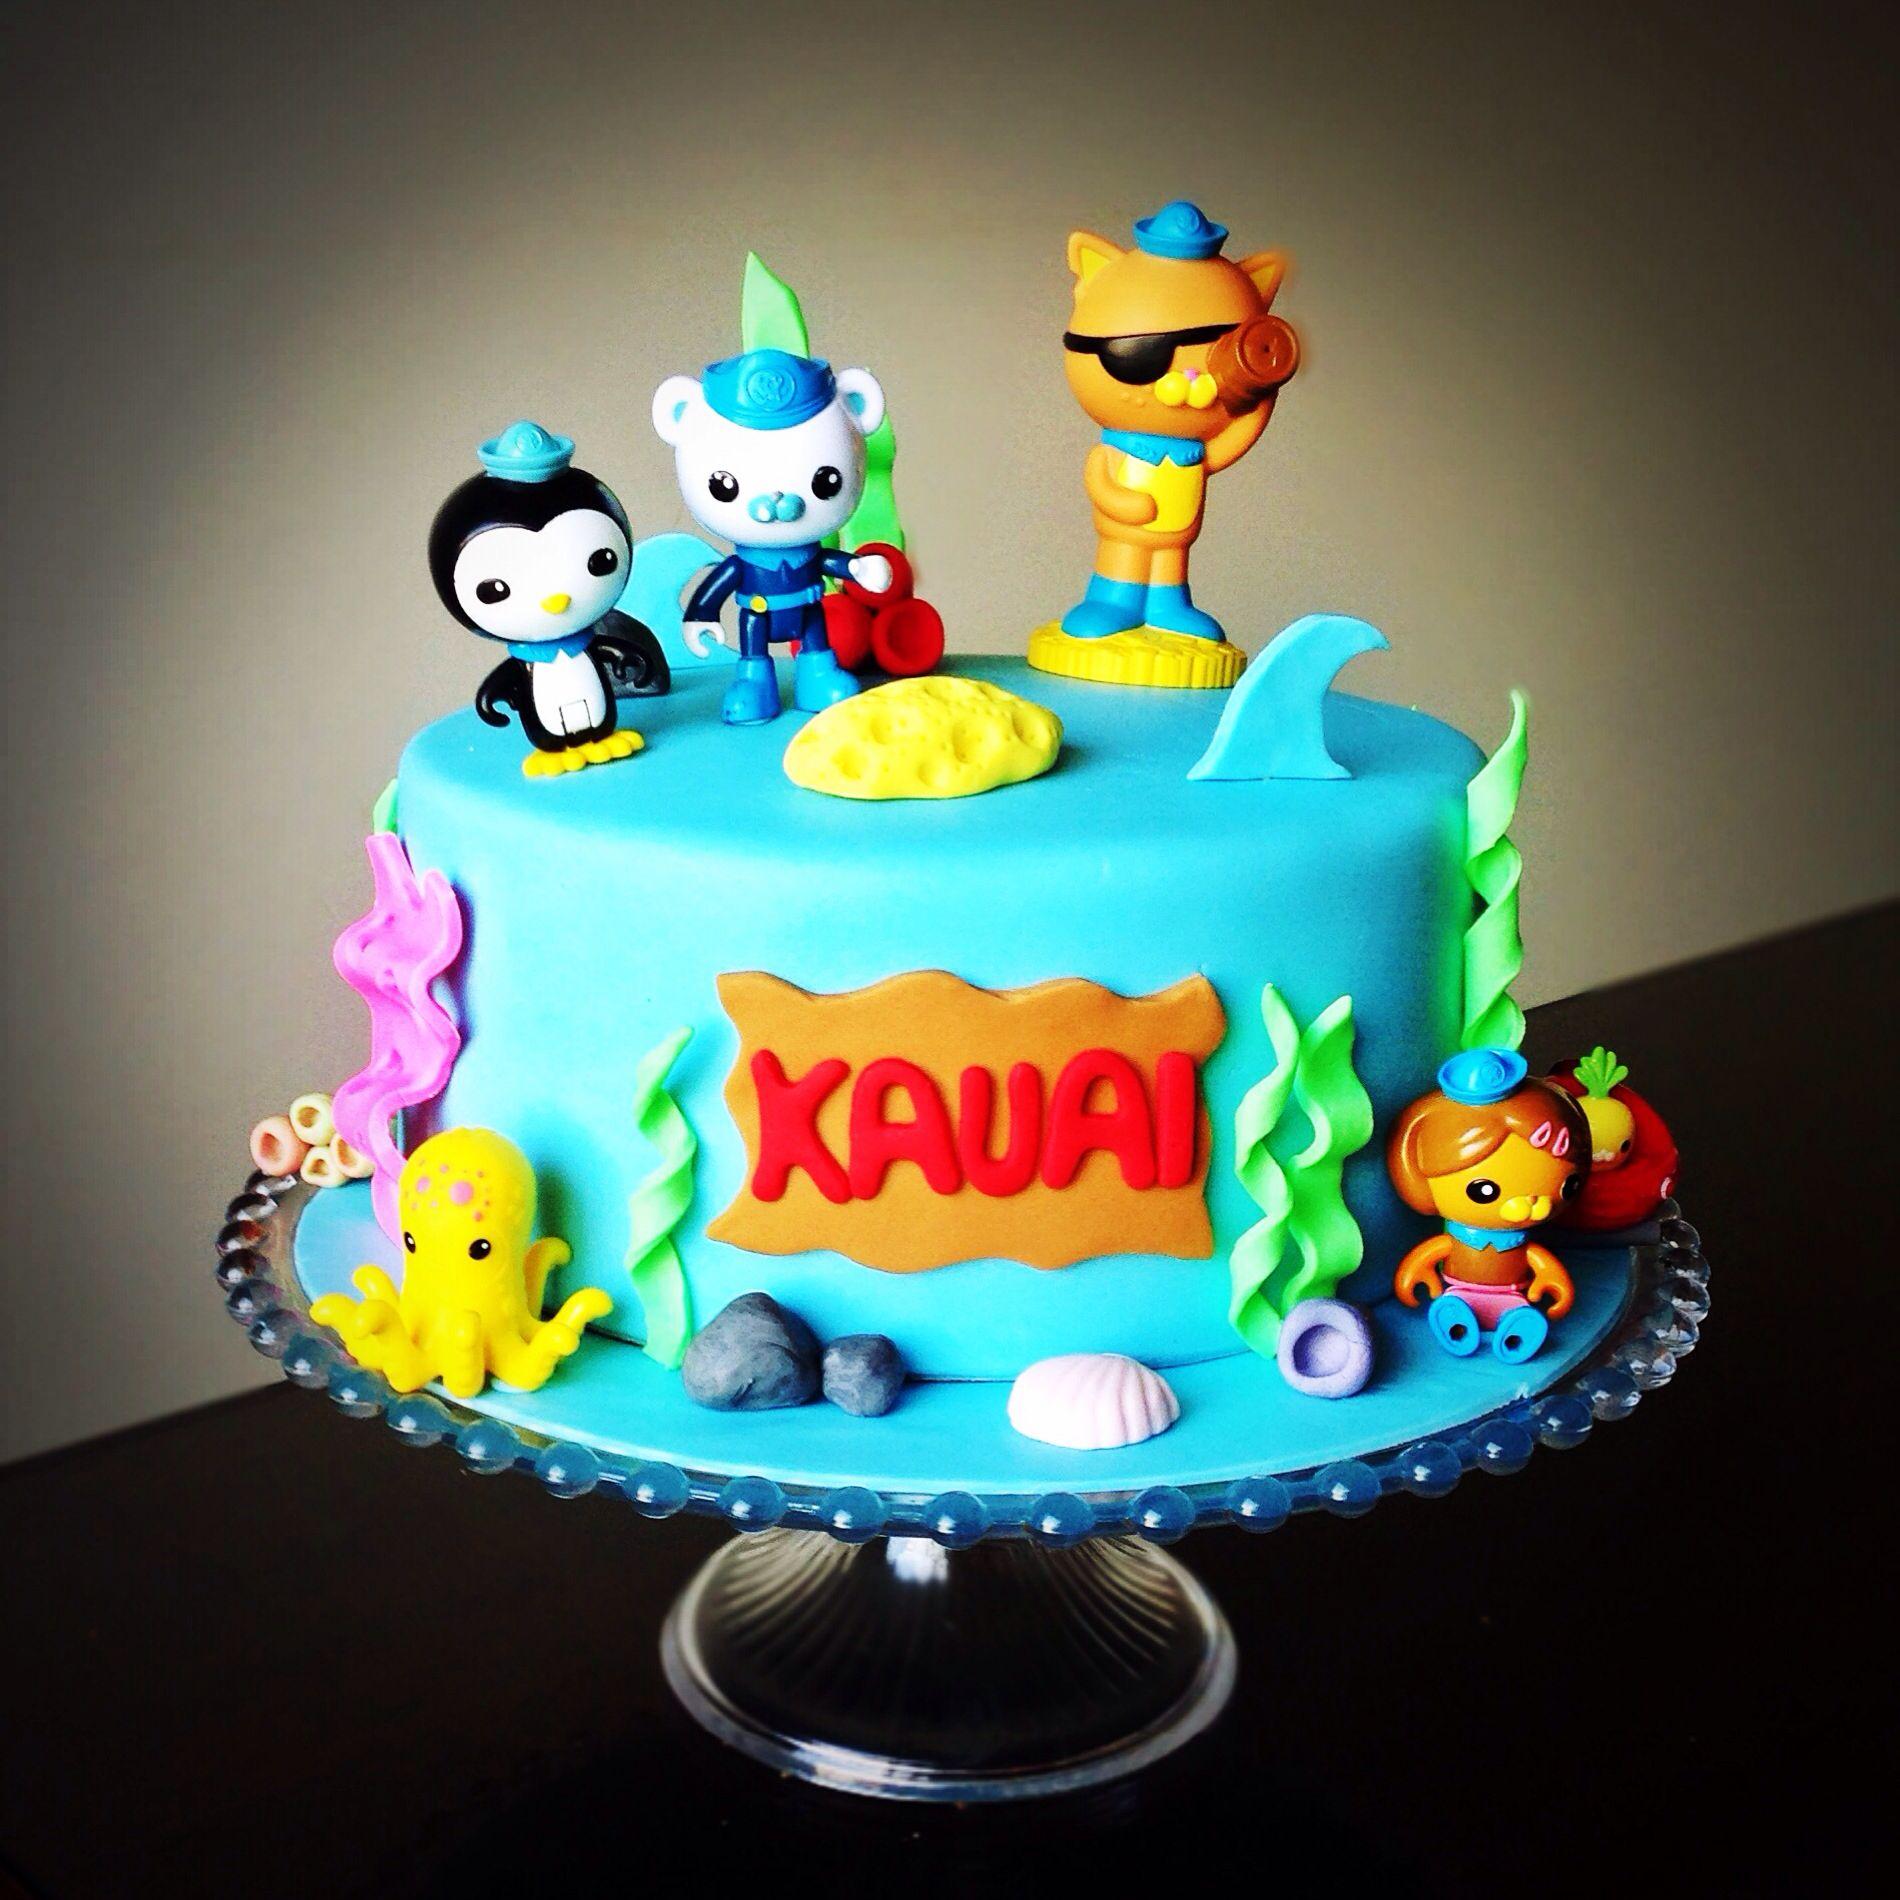 Octonauts cake | Octonauts cake, Cake, Octonauts party